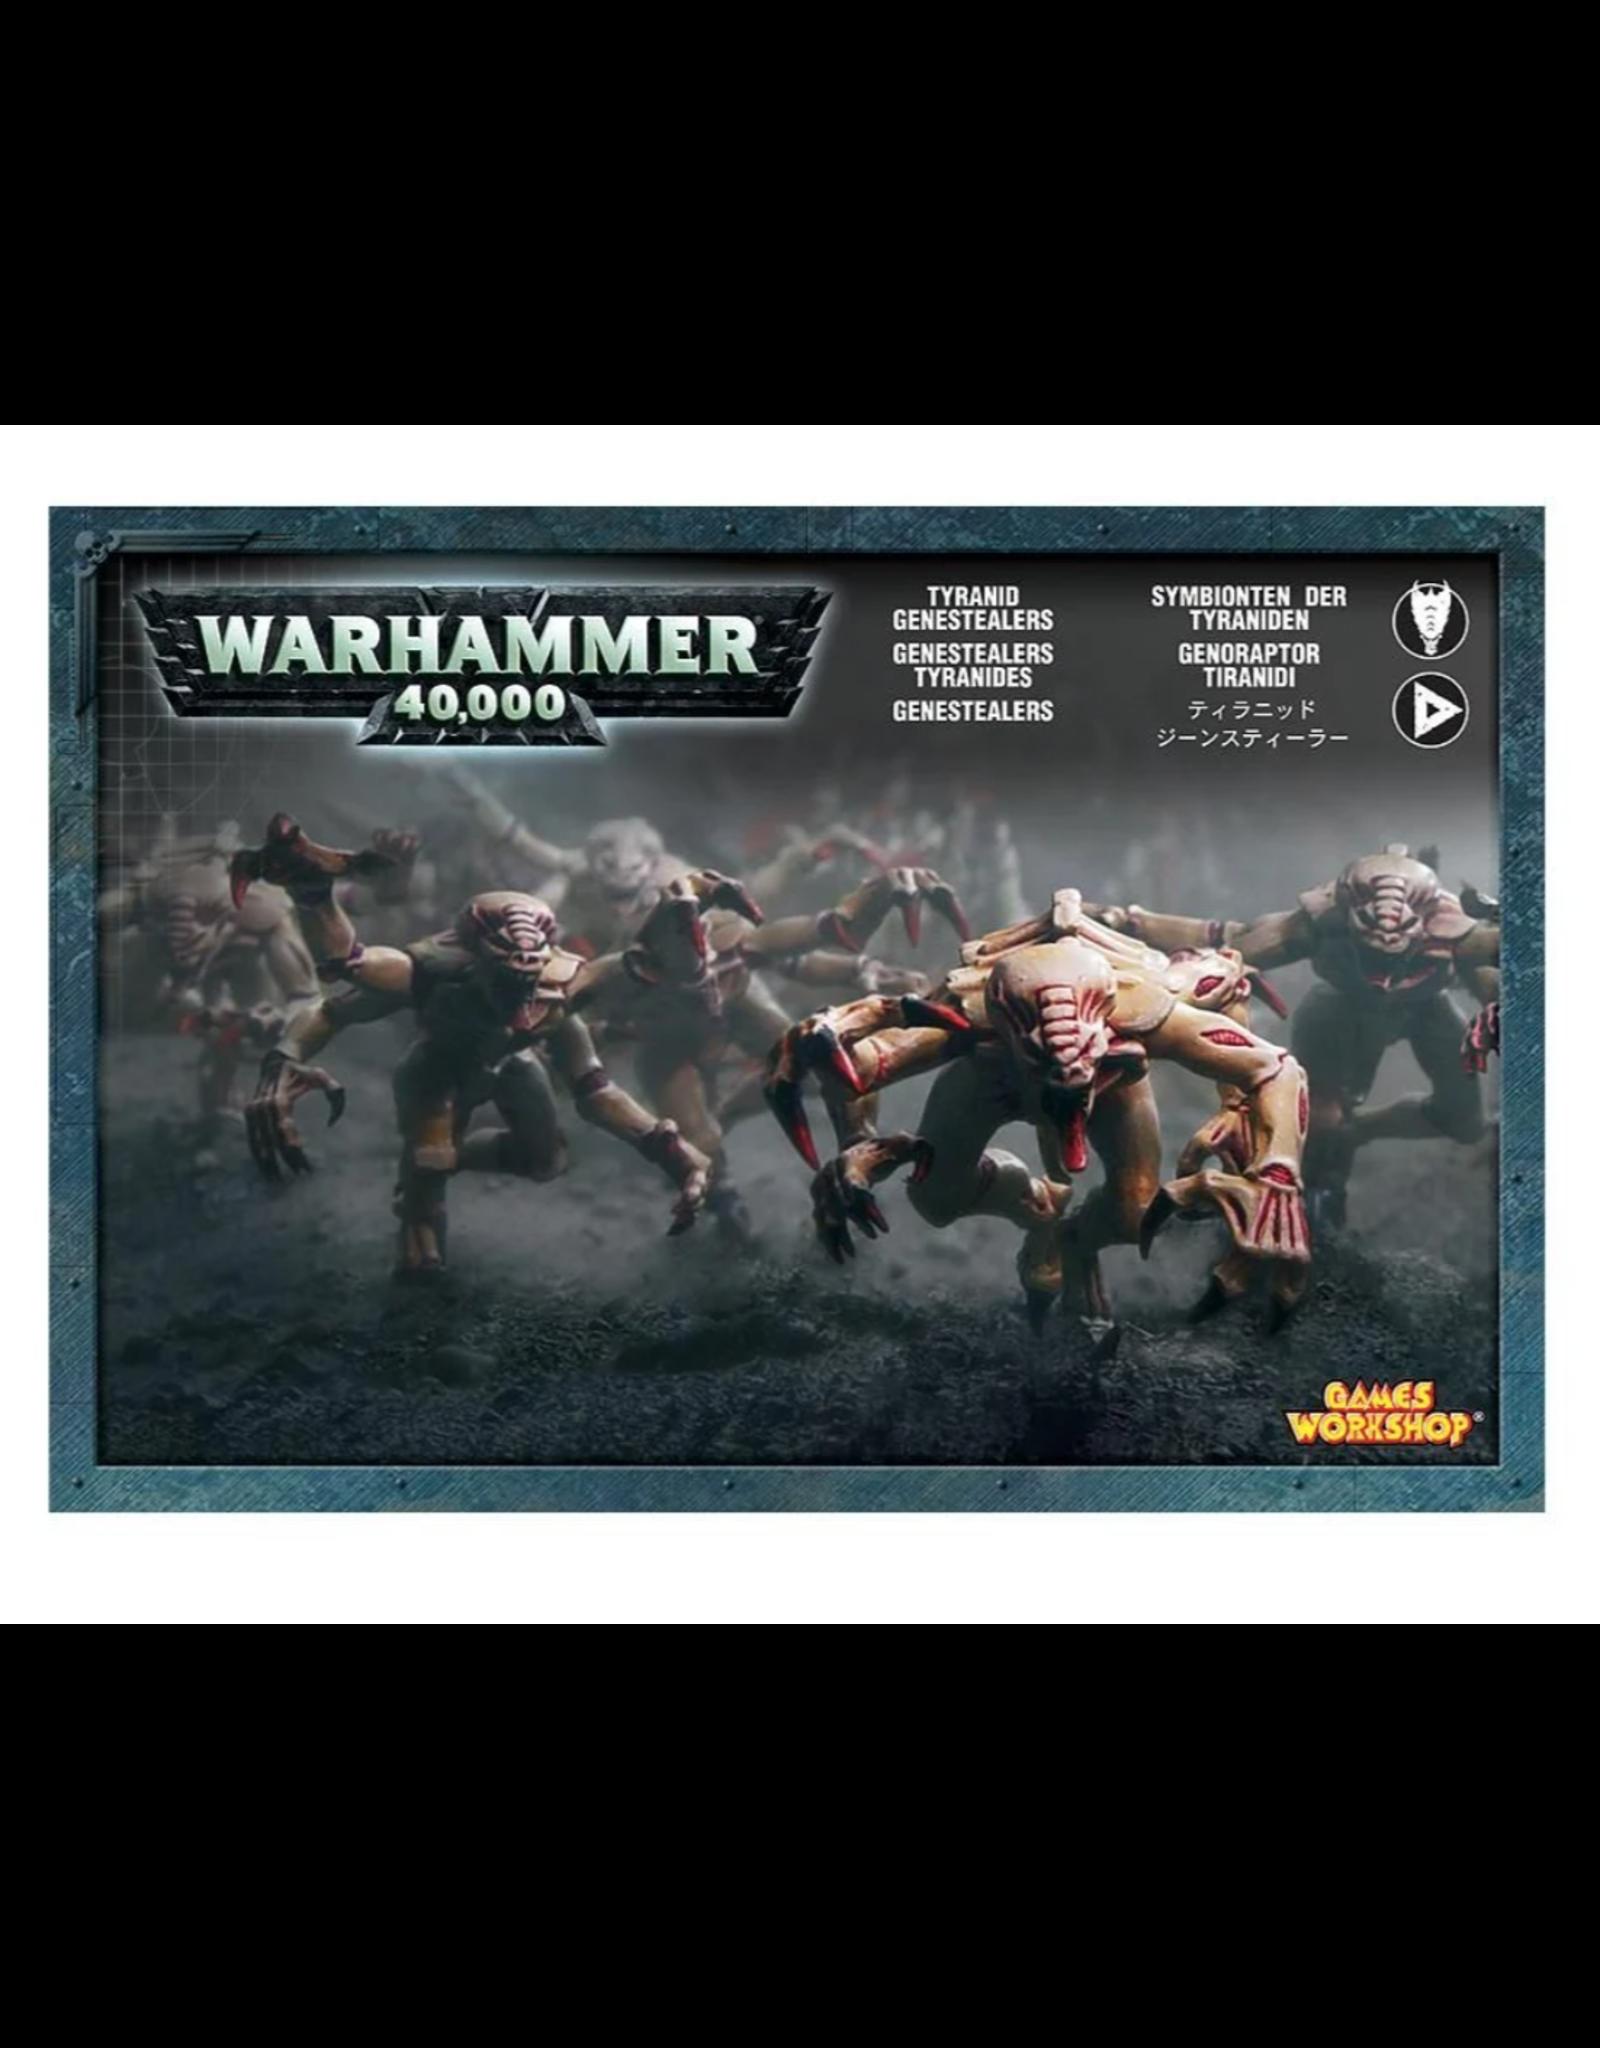 Warhammer 40K Tyranid Genestealer Brood